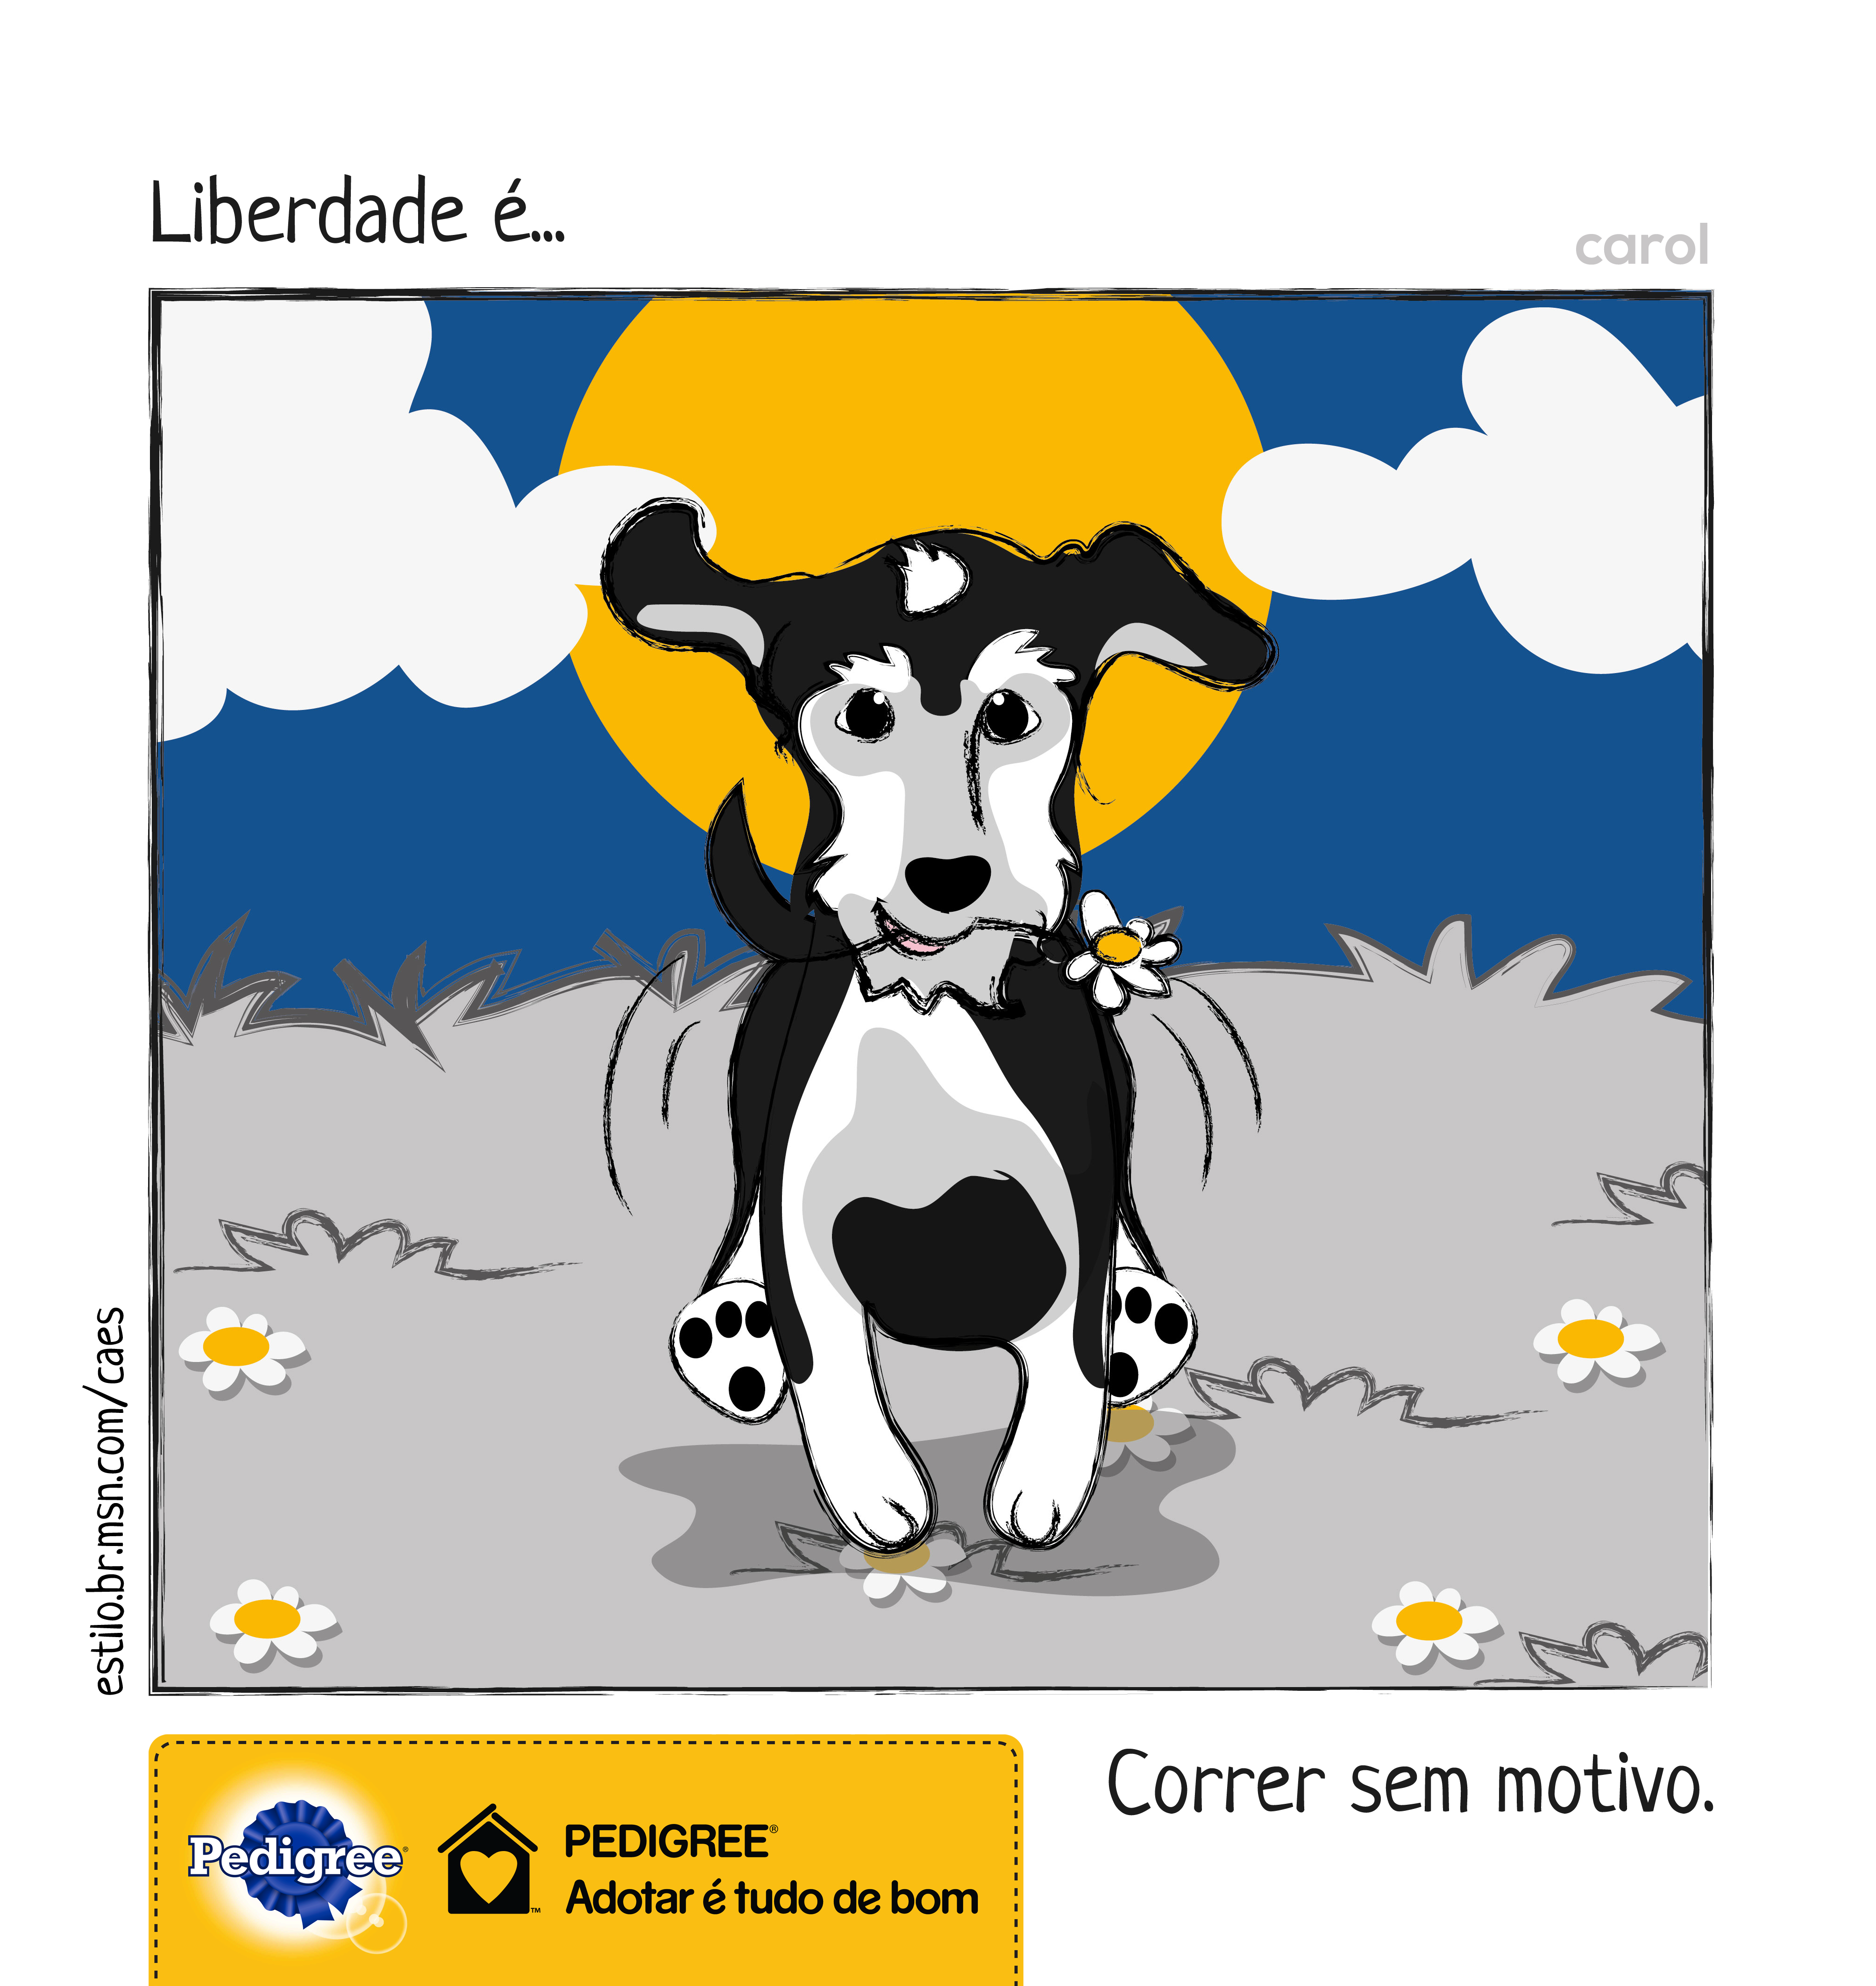 carol_pedigree_08_alta_v2